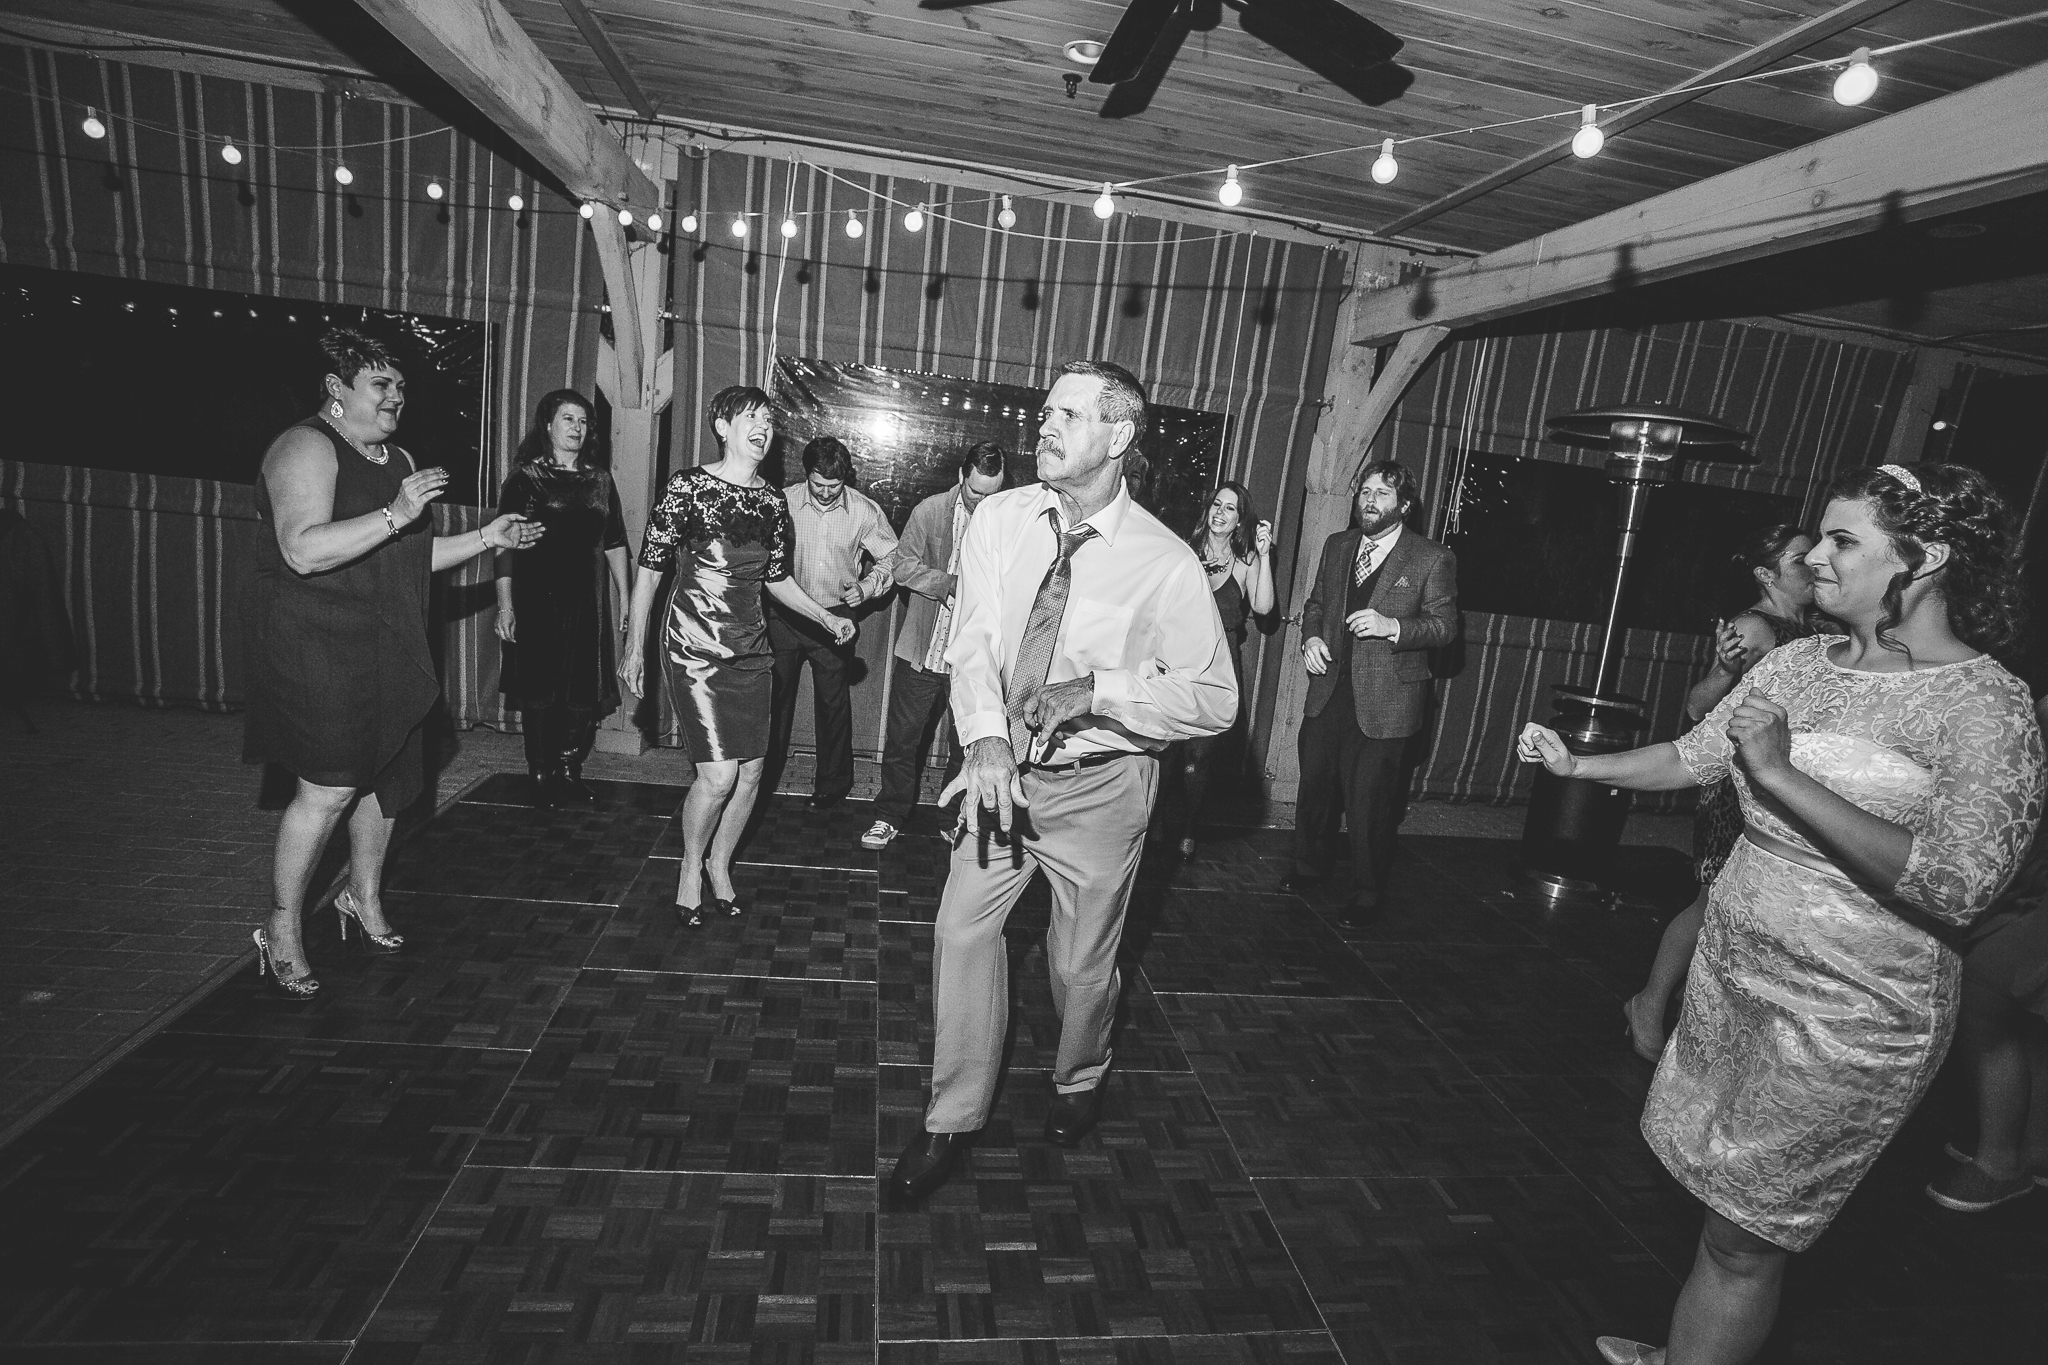 camuglia-whomstudio-chelsea_and_andy-nycphotographer-wedding-brooklyn-buffalo-timberlodge-166-5734.jpg